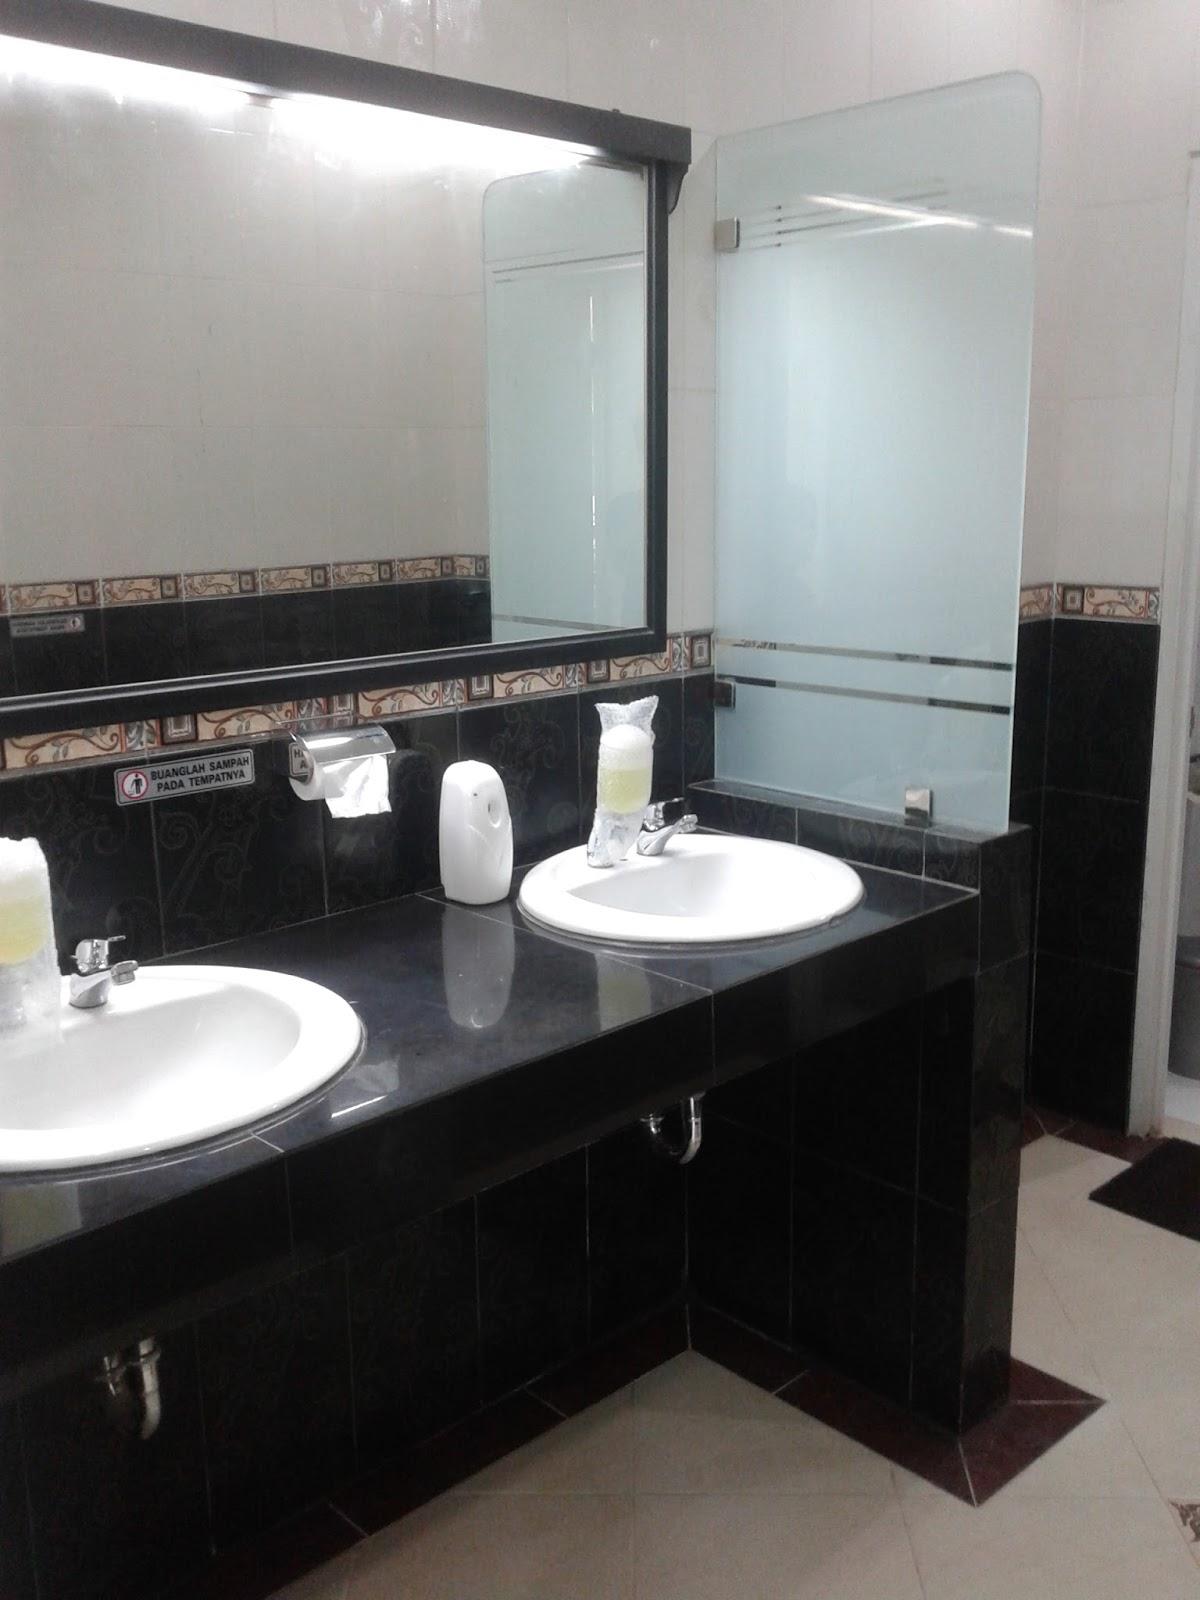 Uniek wastafel toilet badkamermeubels ontwerpen 2017 for Badkamermeubel ontwerpen